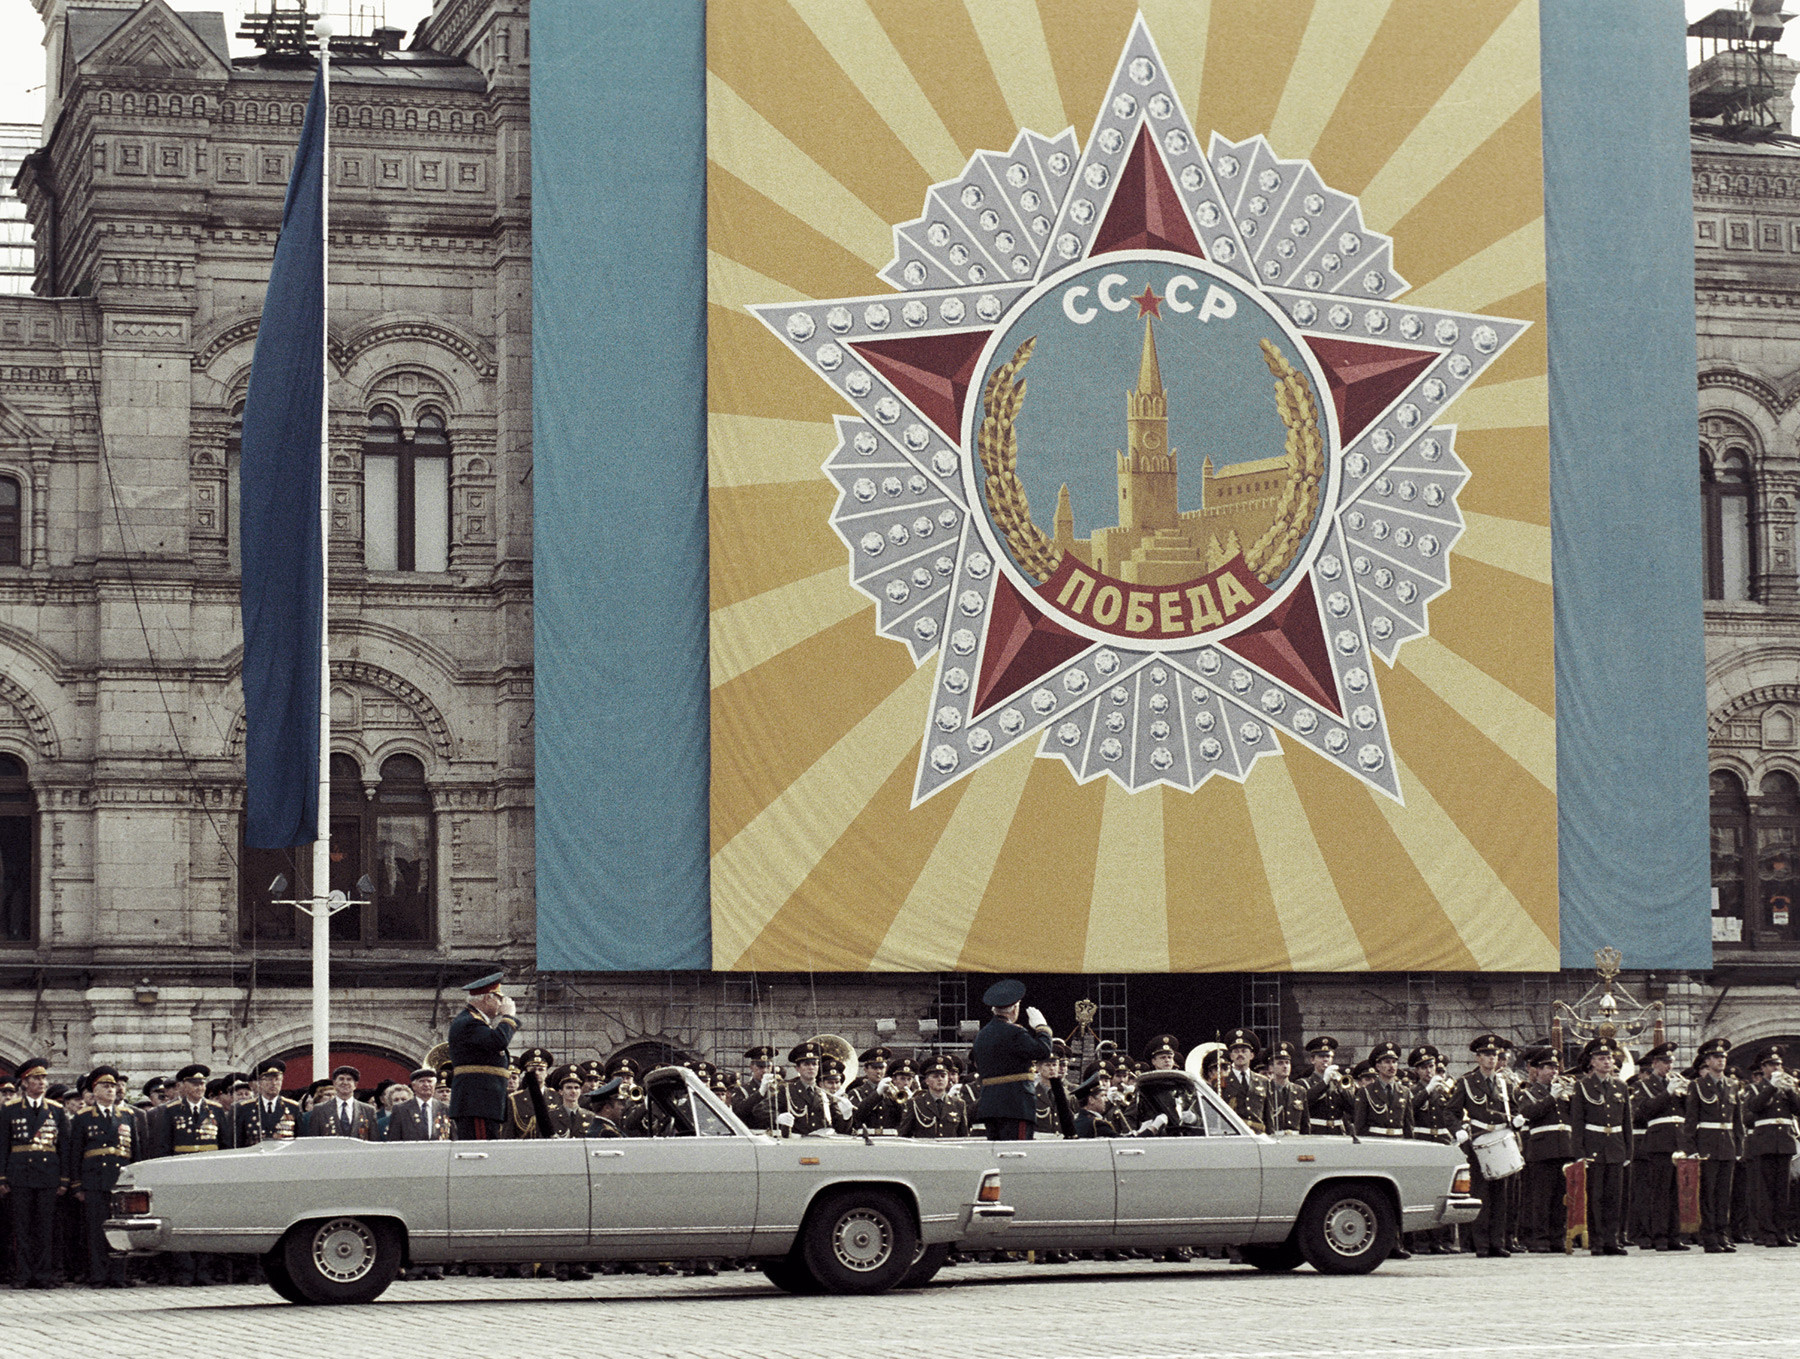 General armije Vladimir Govorov i maršal Sovjetskog Saveza, Viktor Kulikov u automobilima na Paradi veterana Velikog domovinskog rata povodom 50-godišnjice proslave.